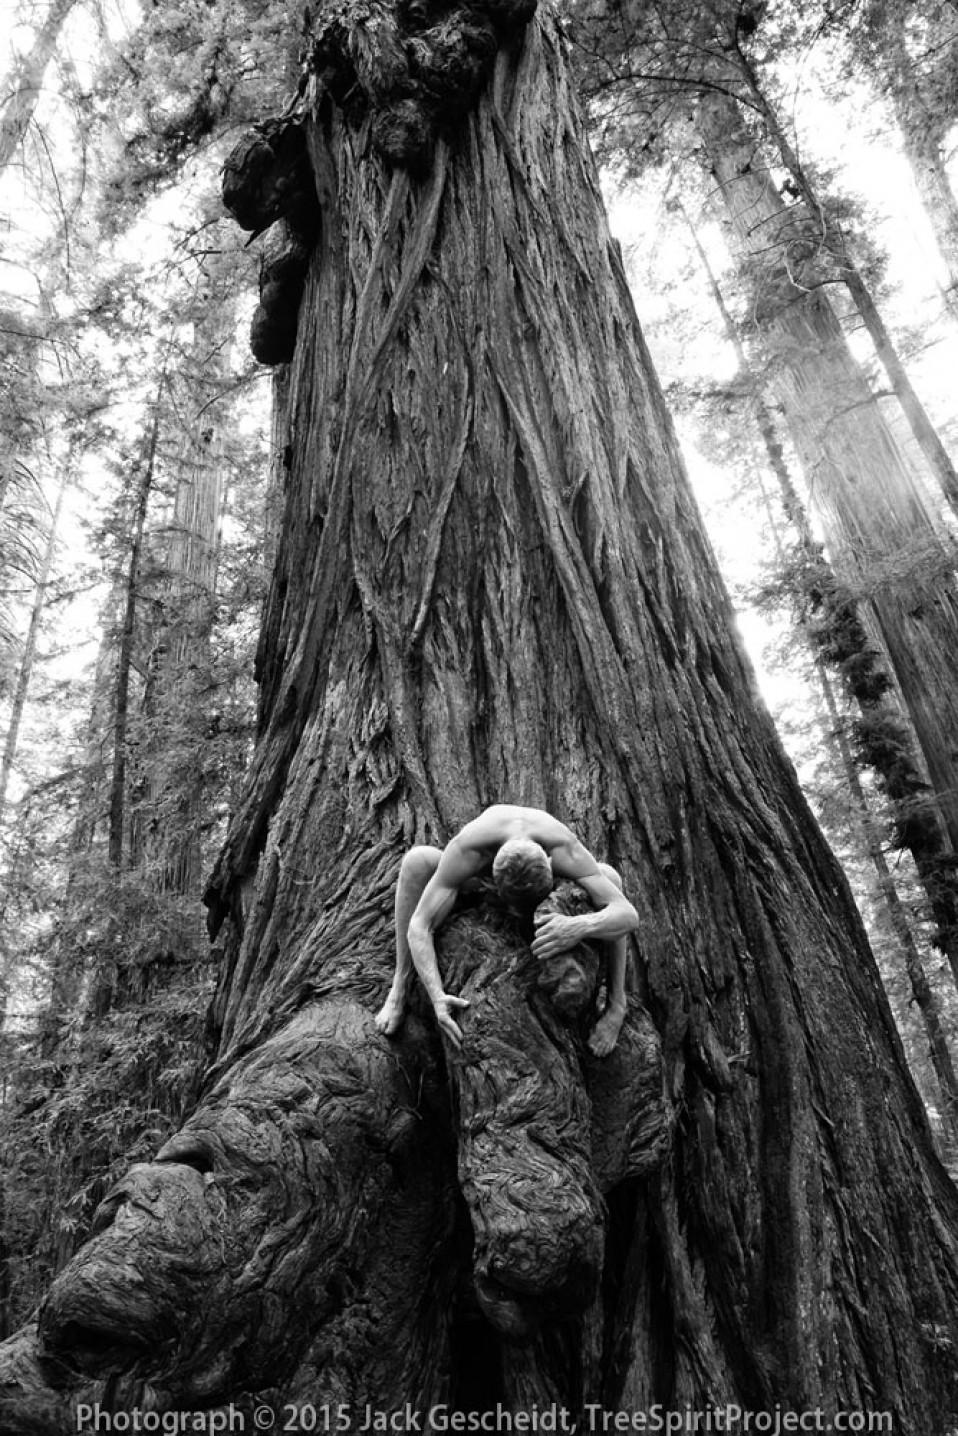 Big-Wood-Love-TreeSpiritProject-Jack-0148-1000p-WEB